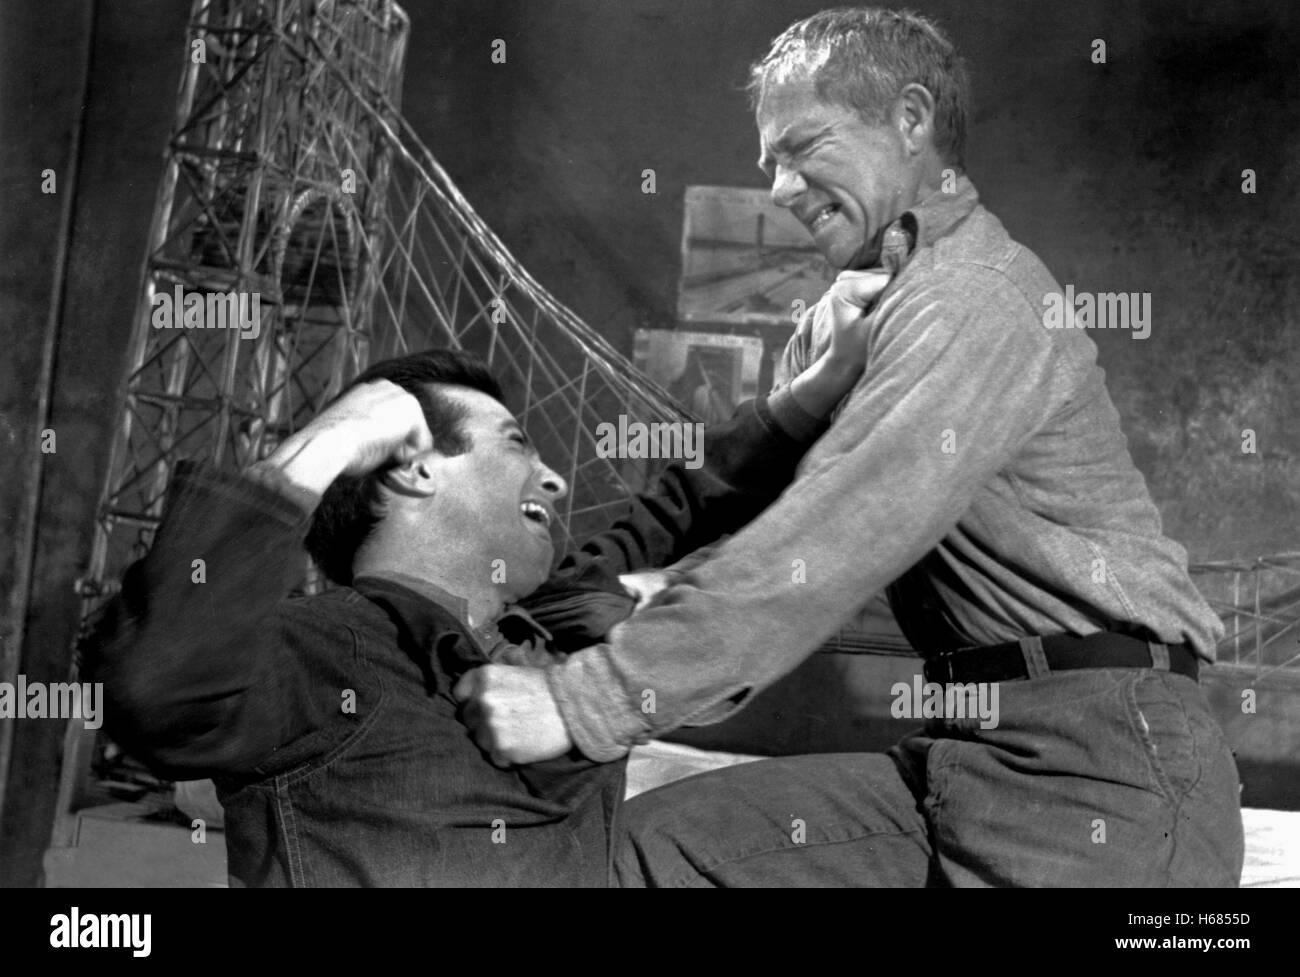 KAMPF-SZENE AUFSCHUB; STRÄFLINGE 4 (1962) Stockbild